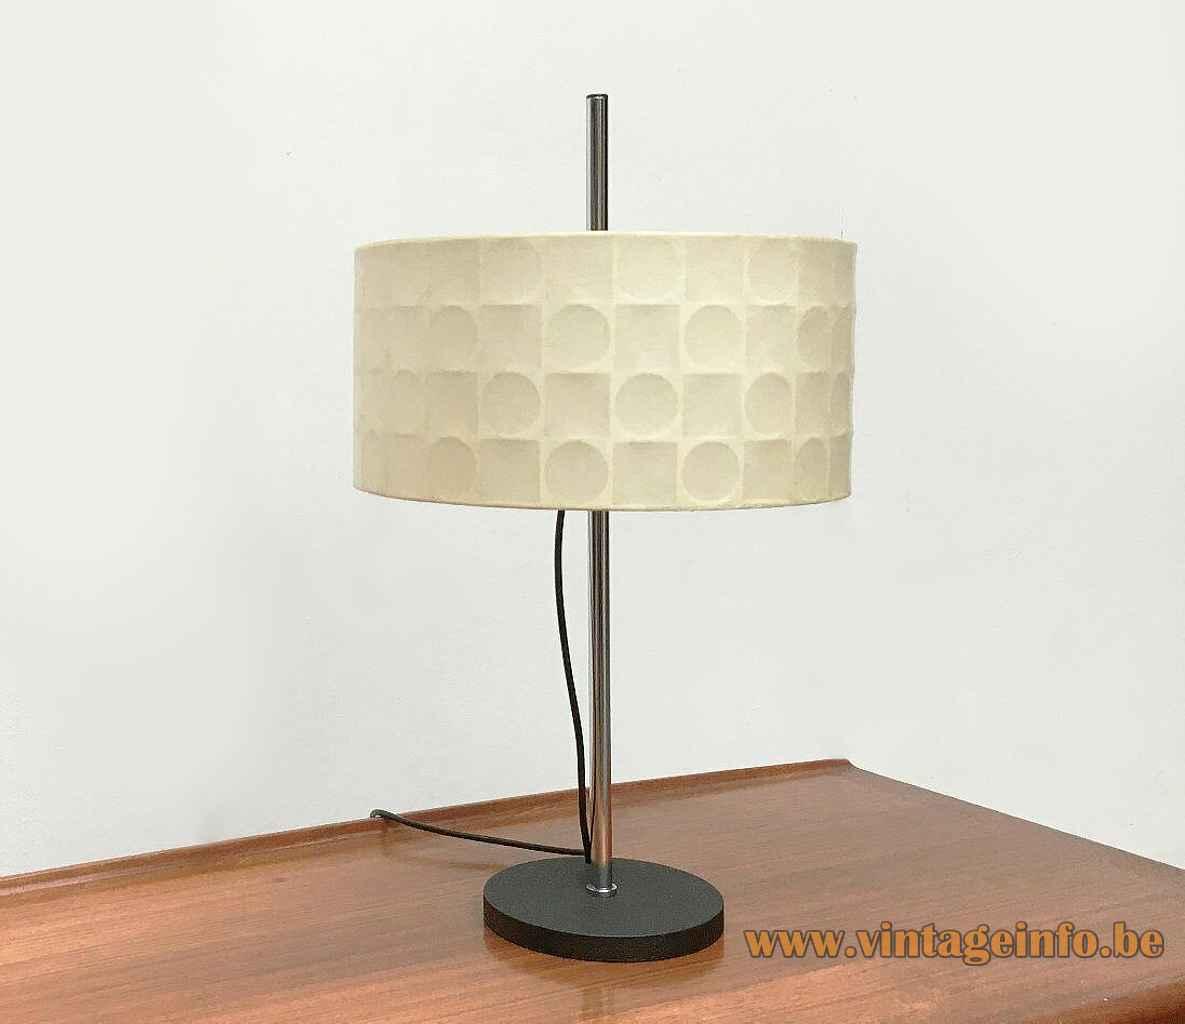 1960s Goldkant Leuchten table lamp round black metal base chrome rod geometric fabric lampshade Germany